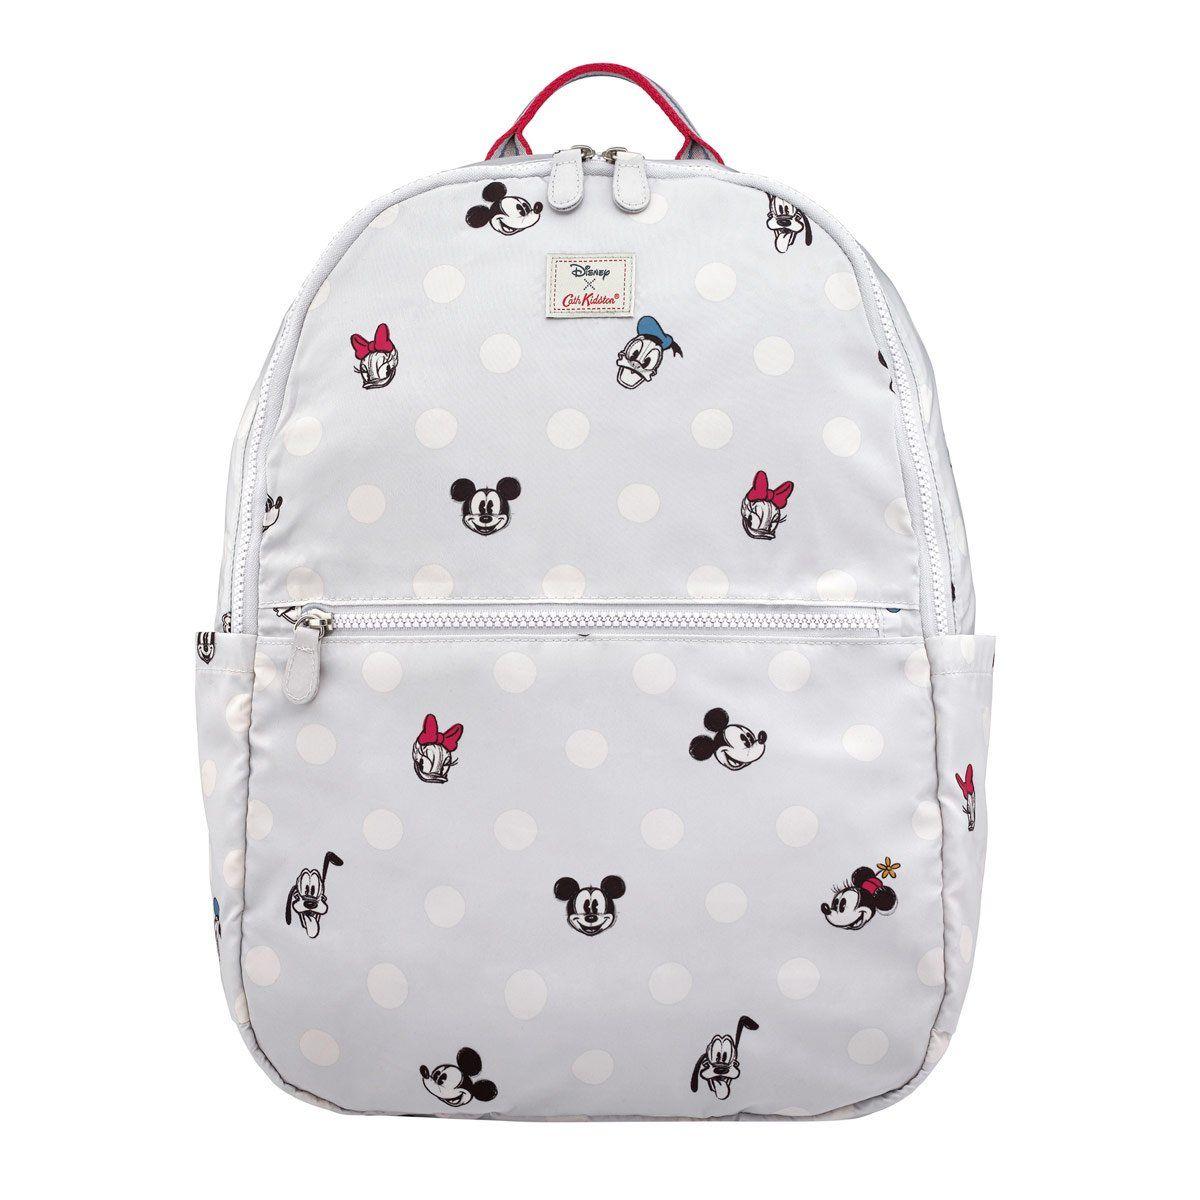 57fa800b9bb Cath Kidston Disney Mickey and Friends Button Spot Foldaway Backpack ...